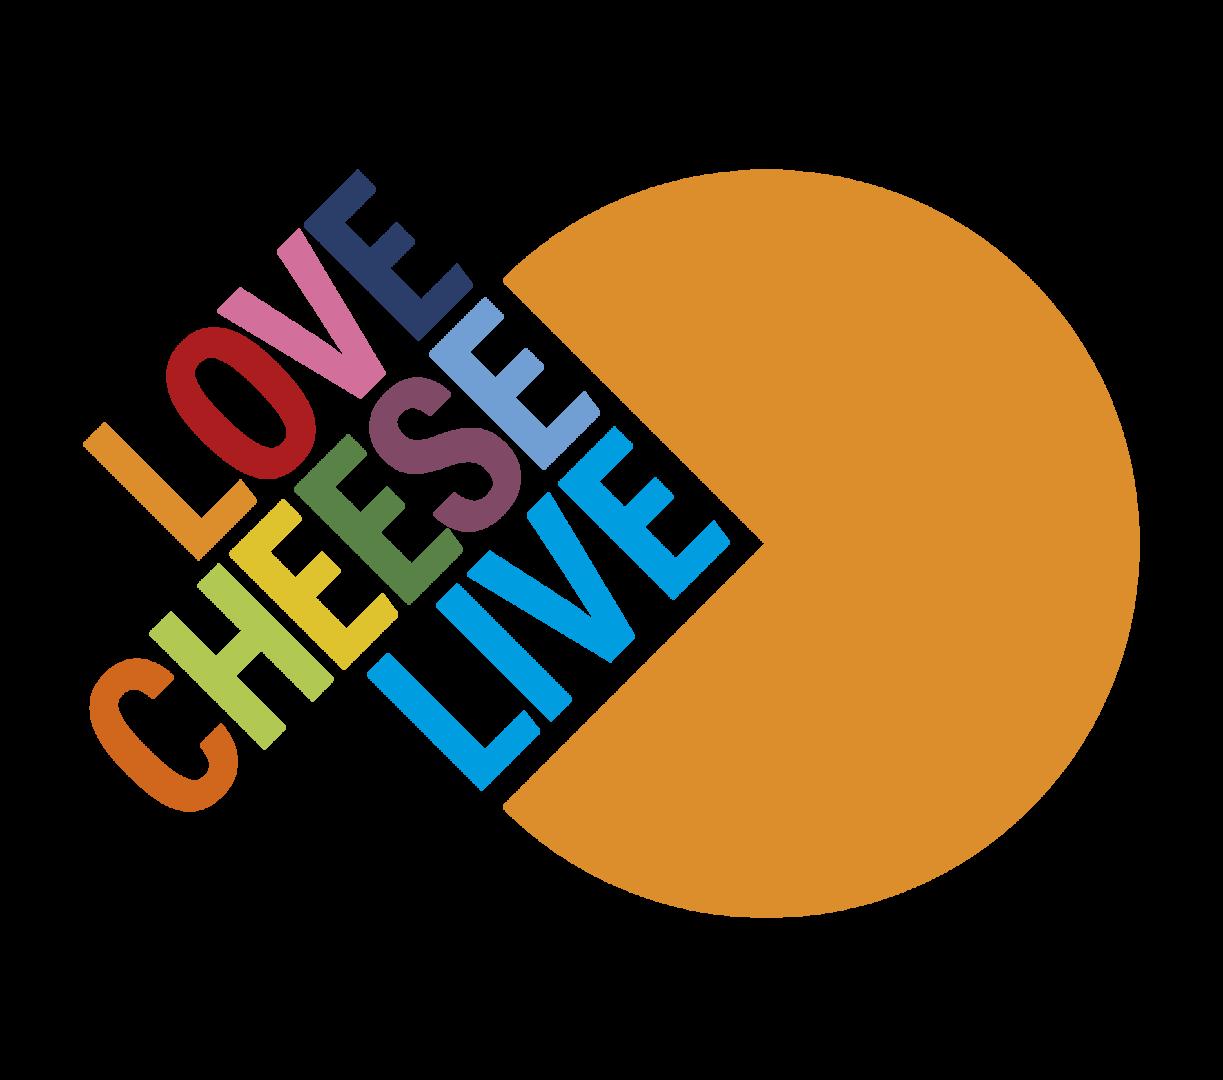 Love Cheese Live